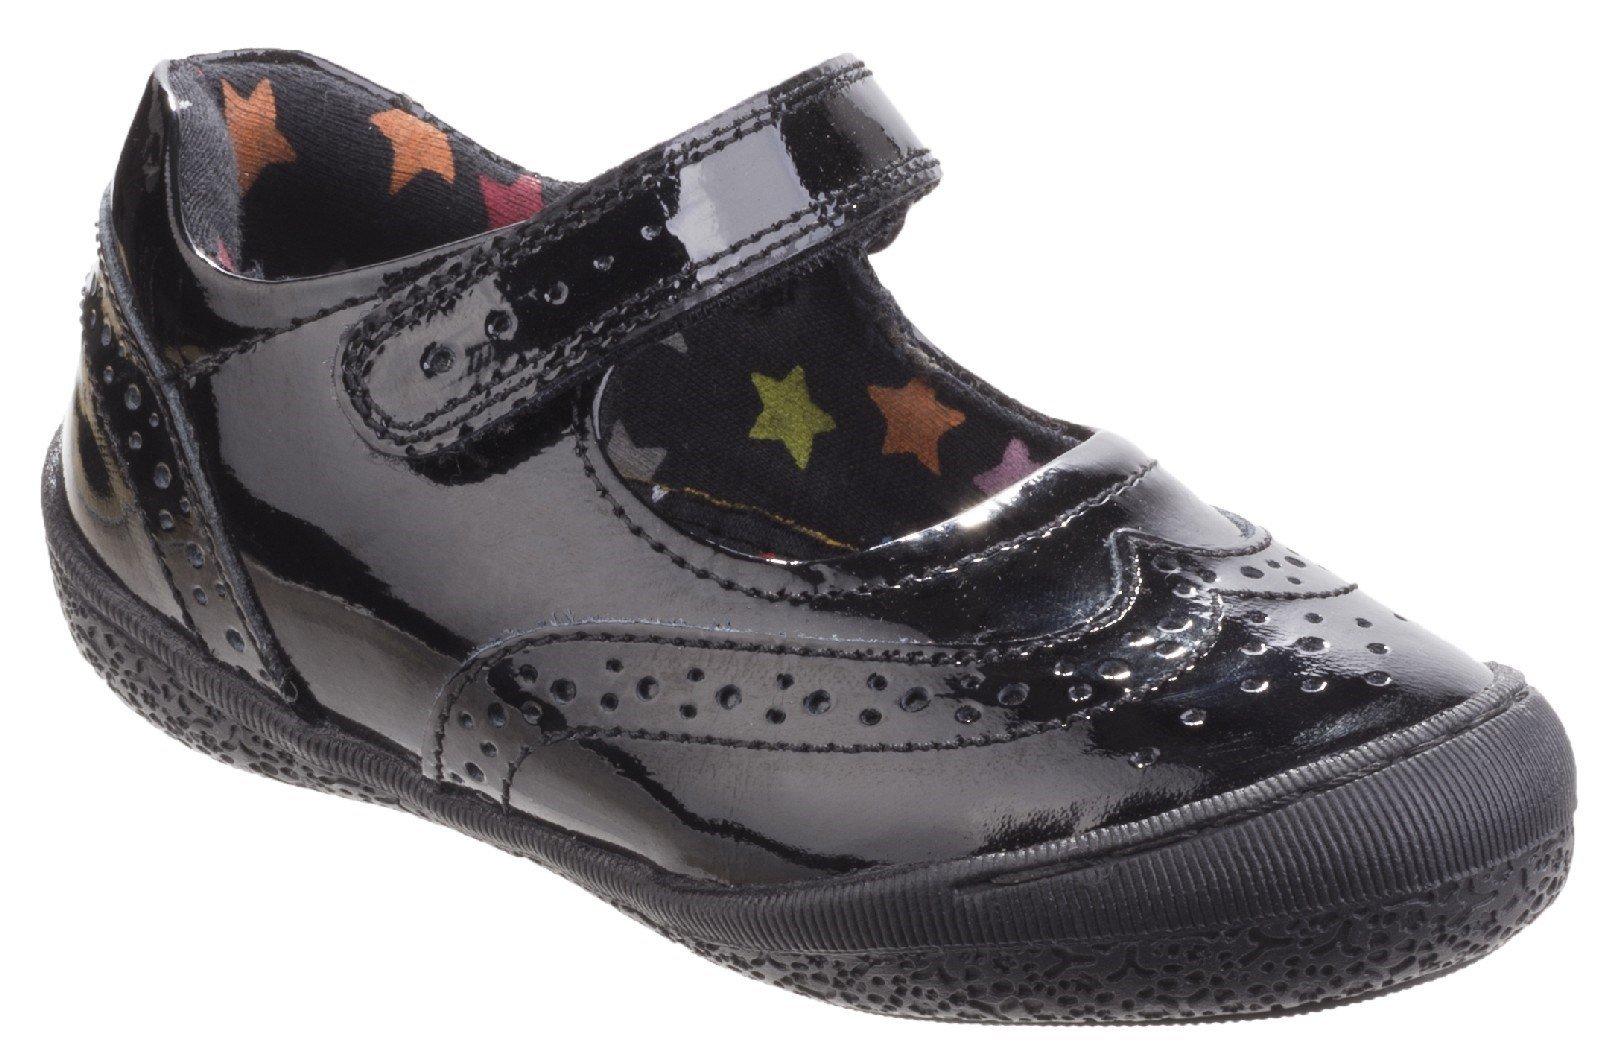 Hush Puppies Women's Rina Touch Fastening Shoe Black 25332 - Black 10